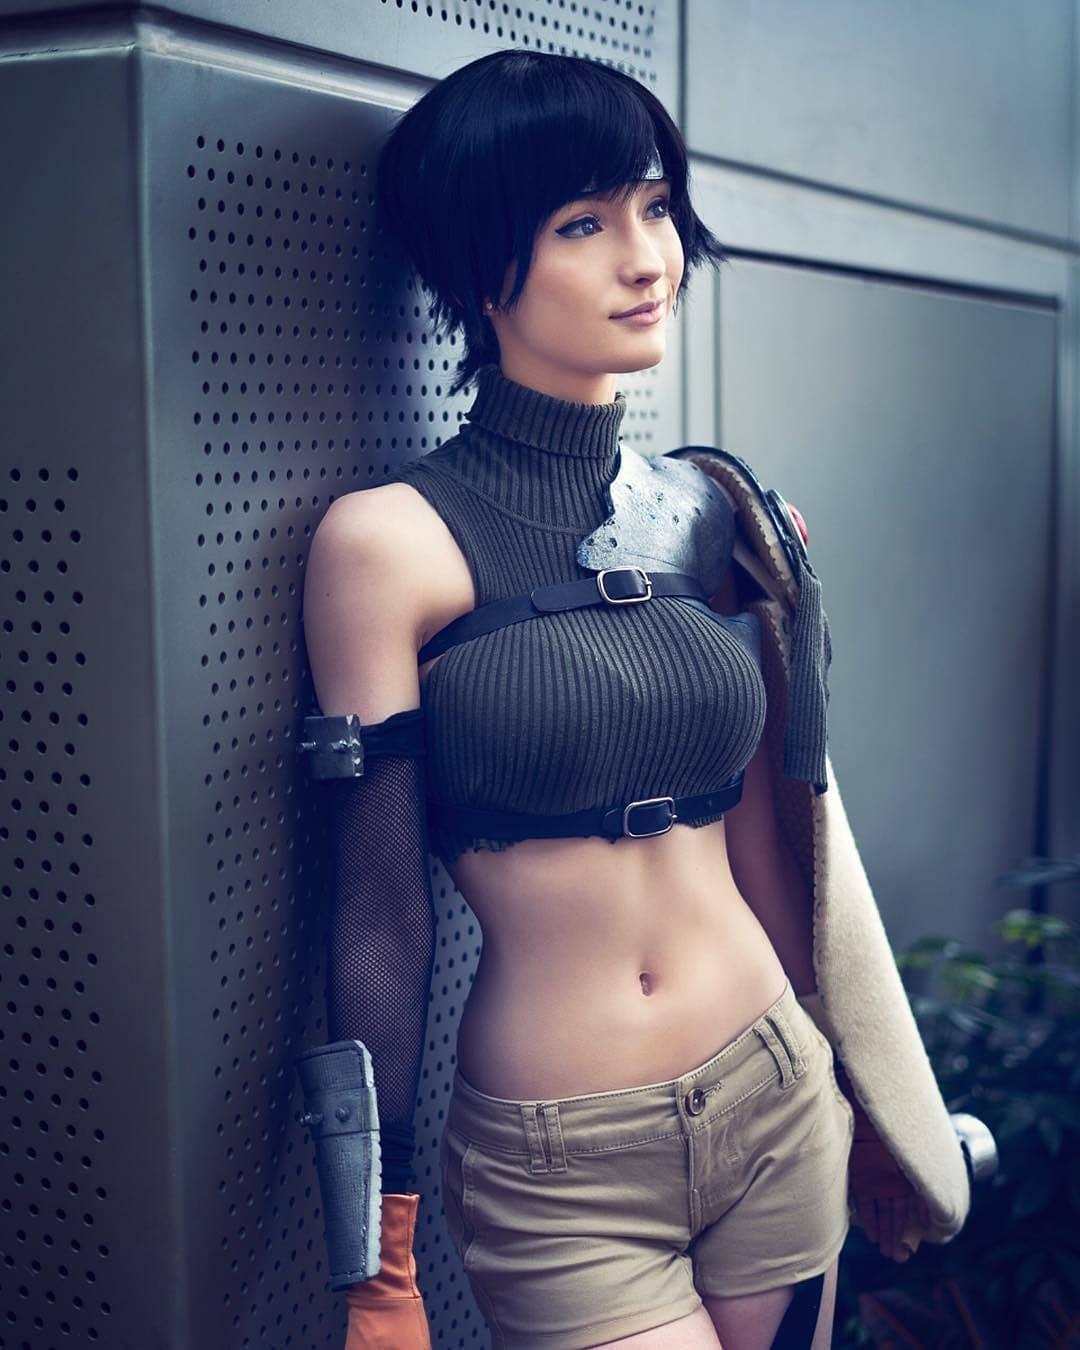 yuffie finalfantasy cosplay by alex_cosplays photo by jwaidesign